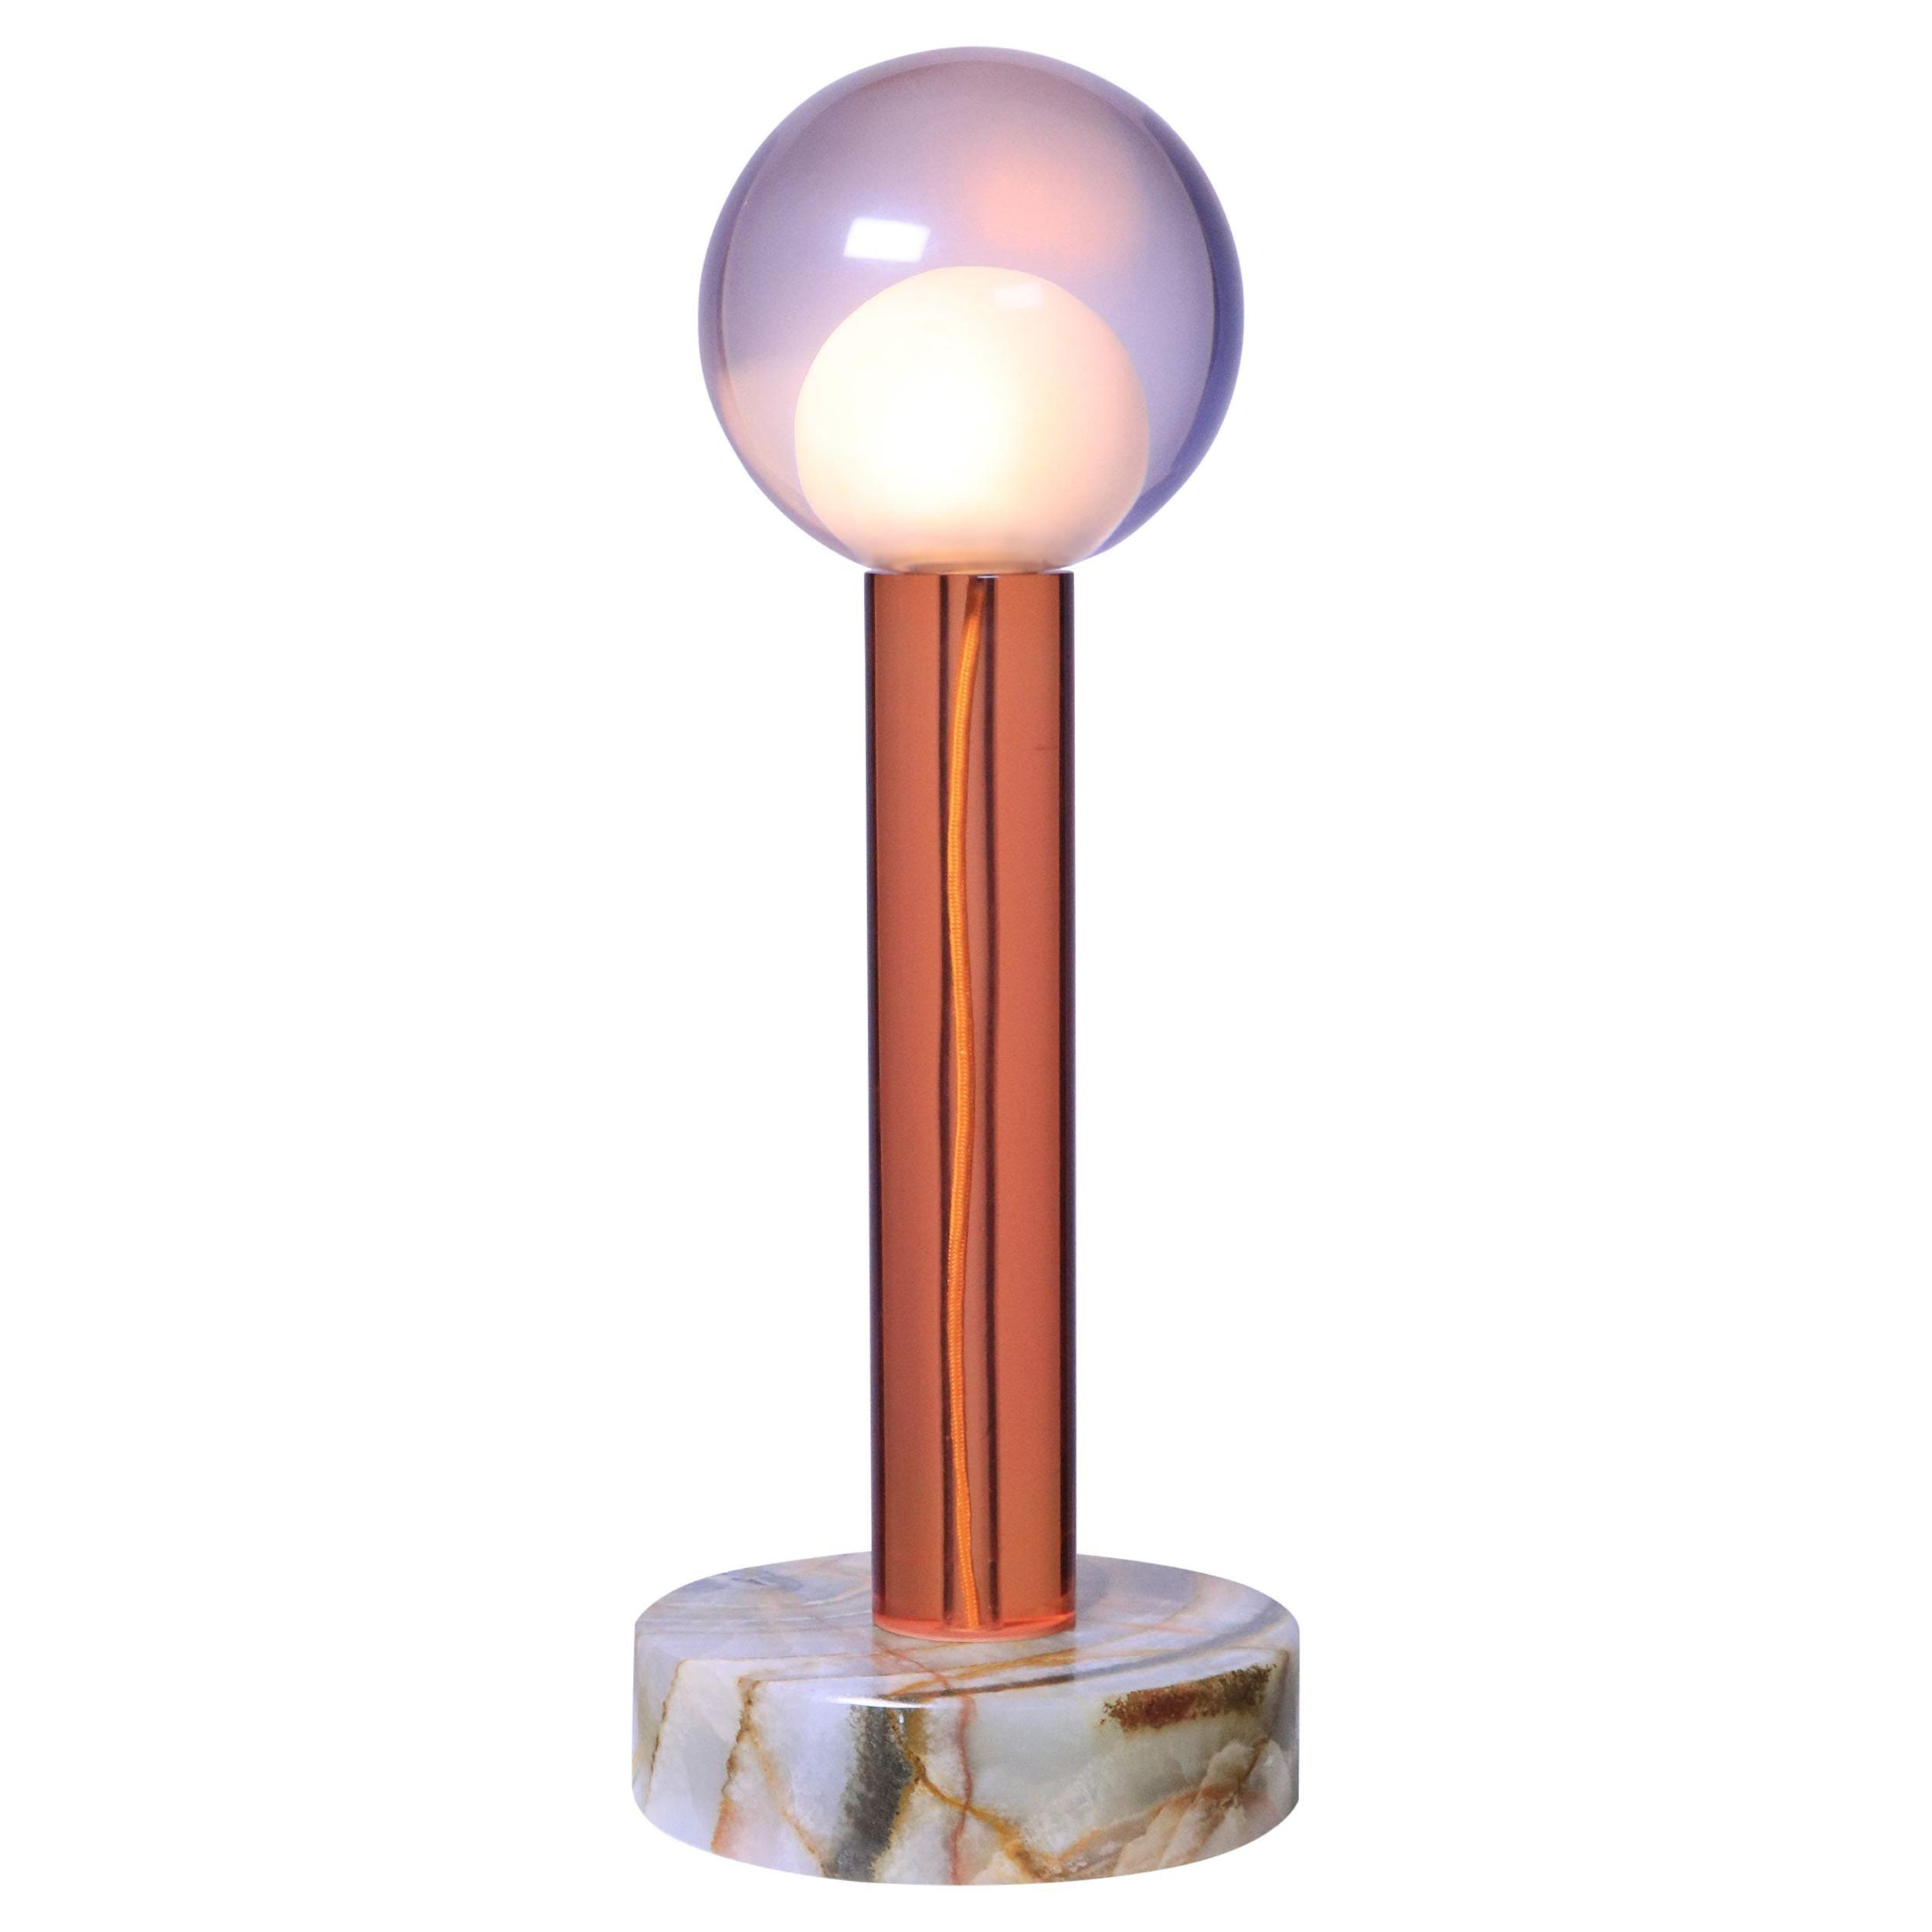 Tallo Orange Lamp in Resin on Onyx Base